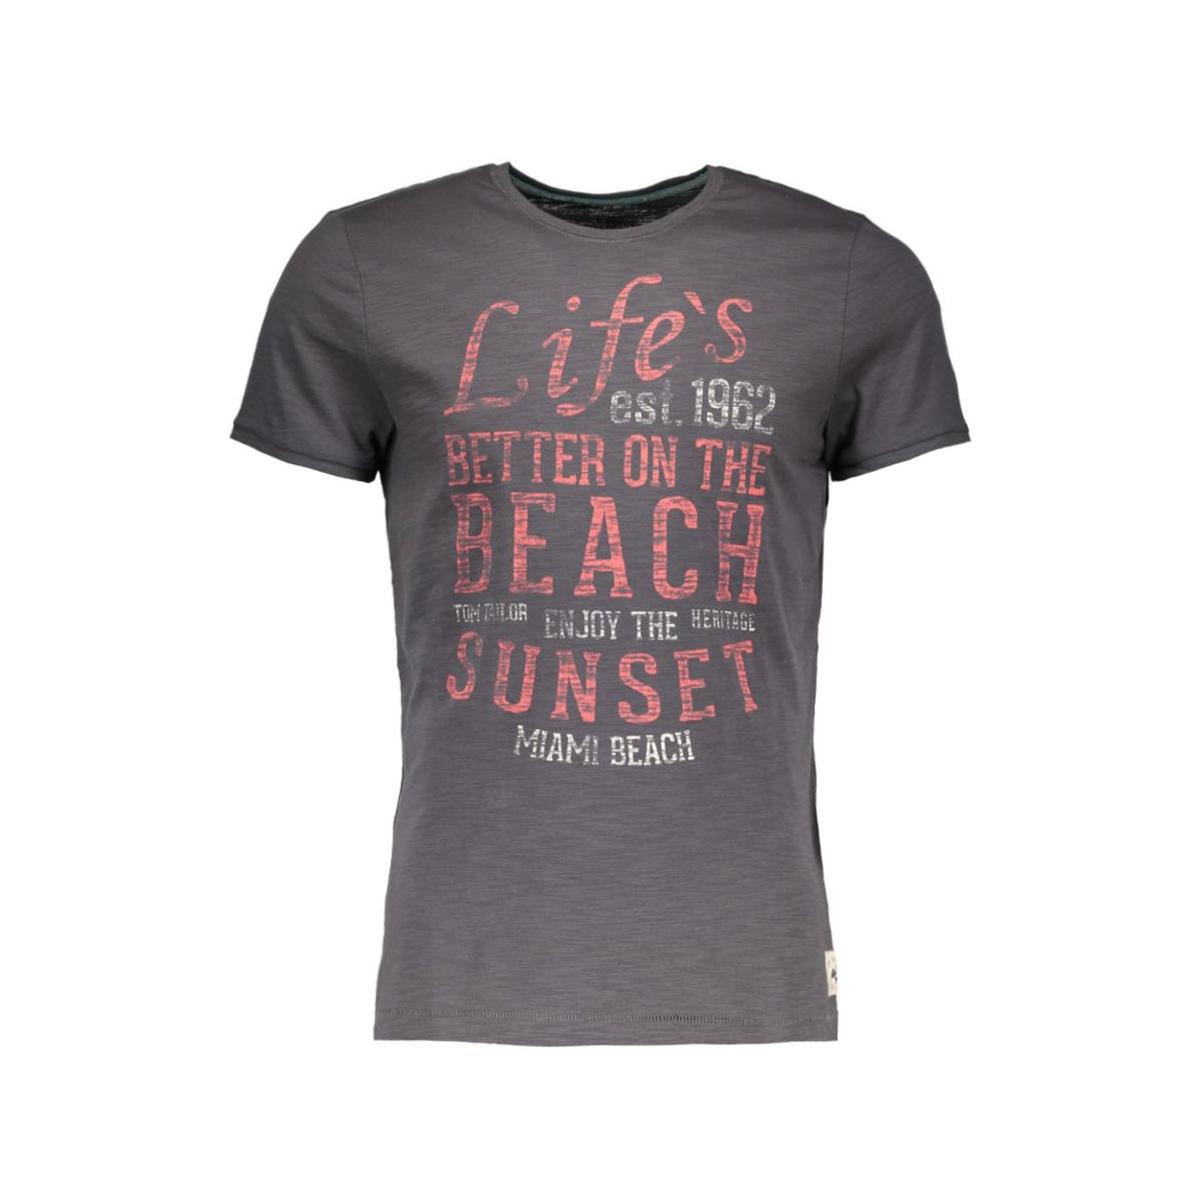 1034854.00.10 tom tailor t-shirt 2983